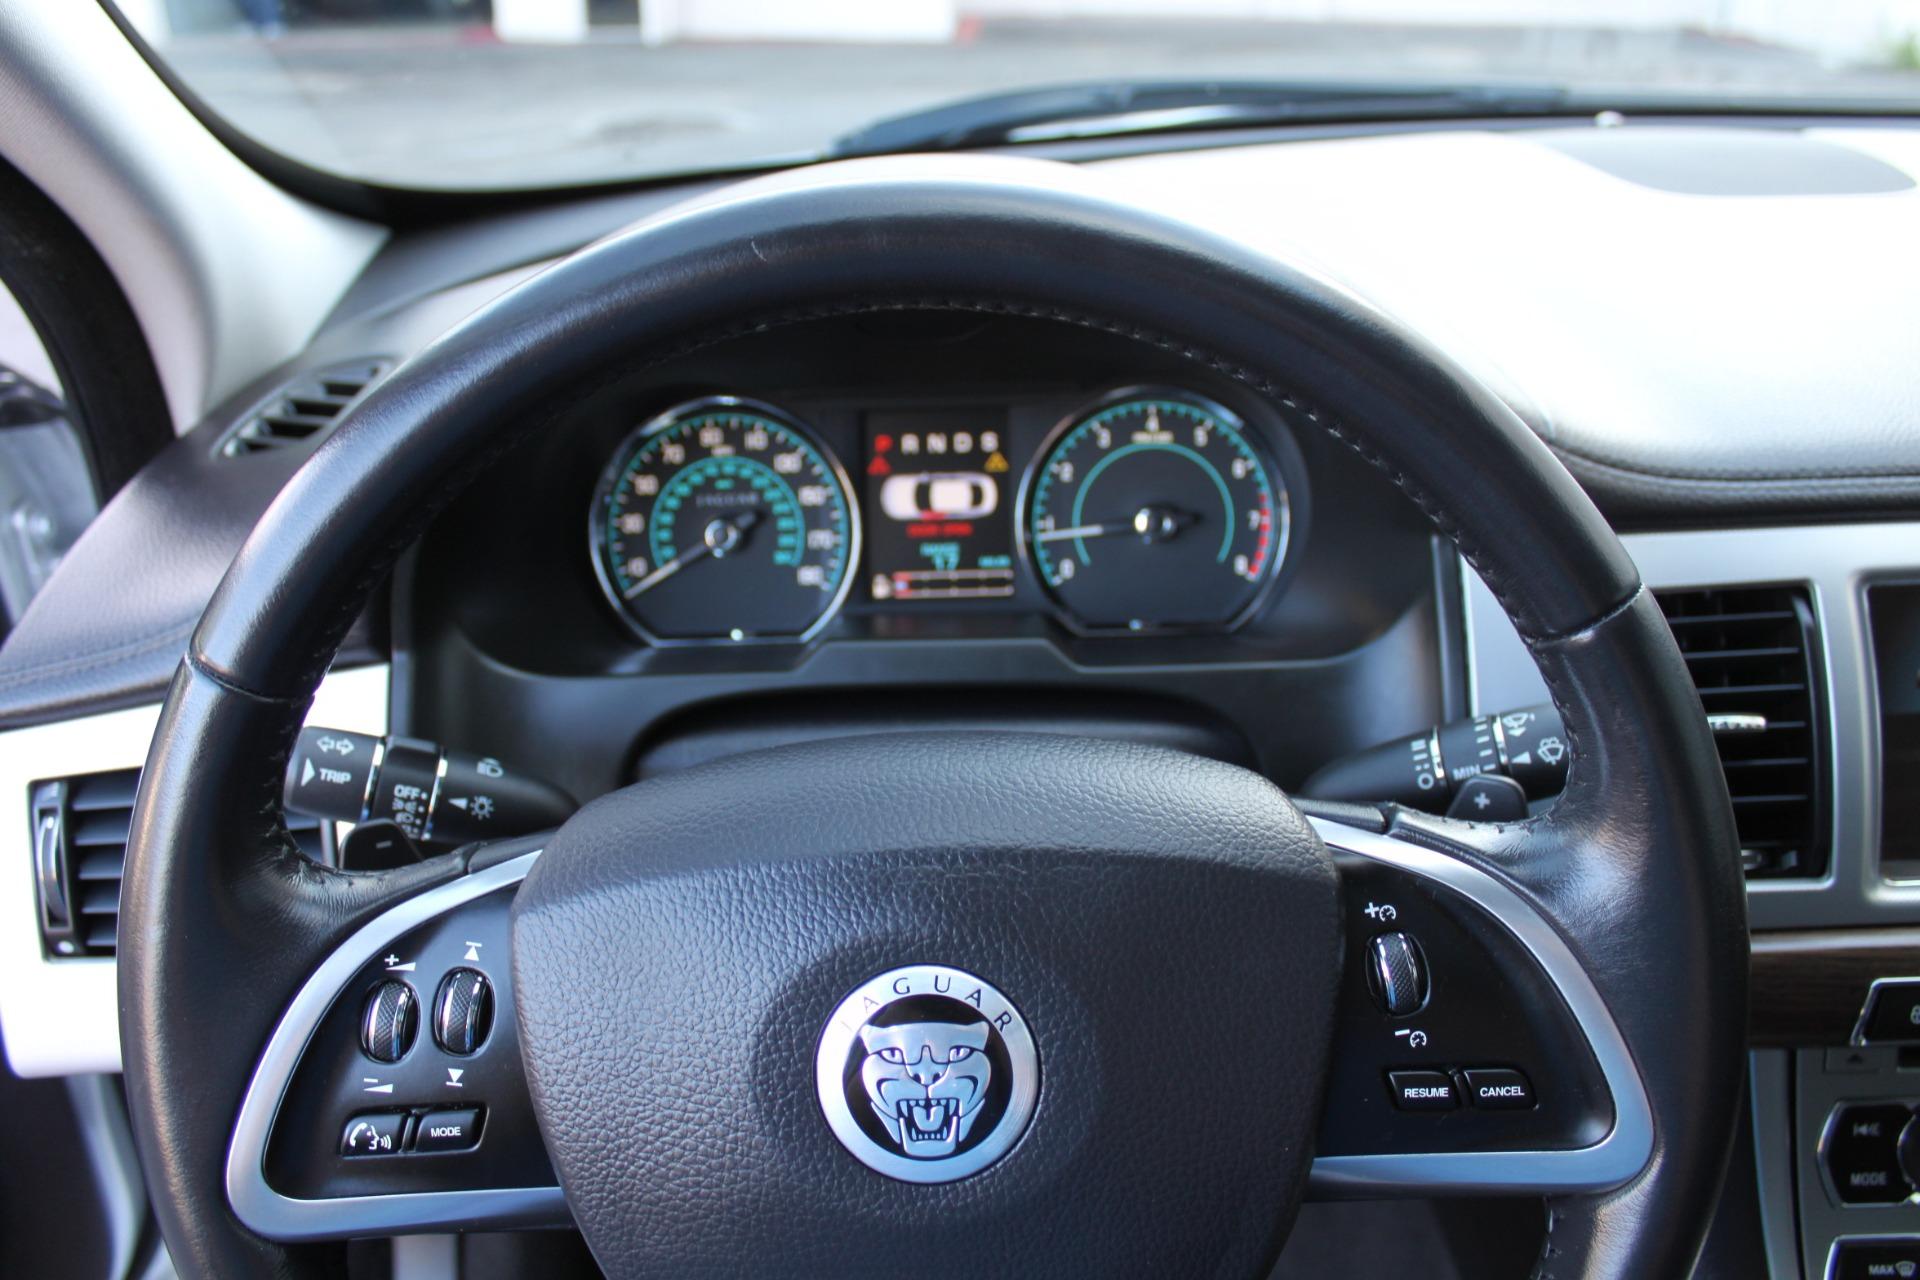 Used-2013-Jaguar-XF-I4-RWD-Ferrari